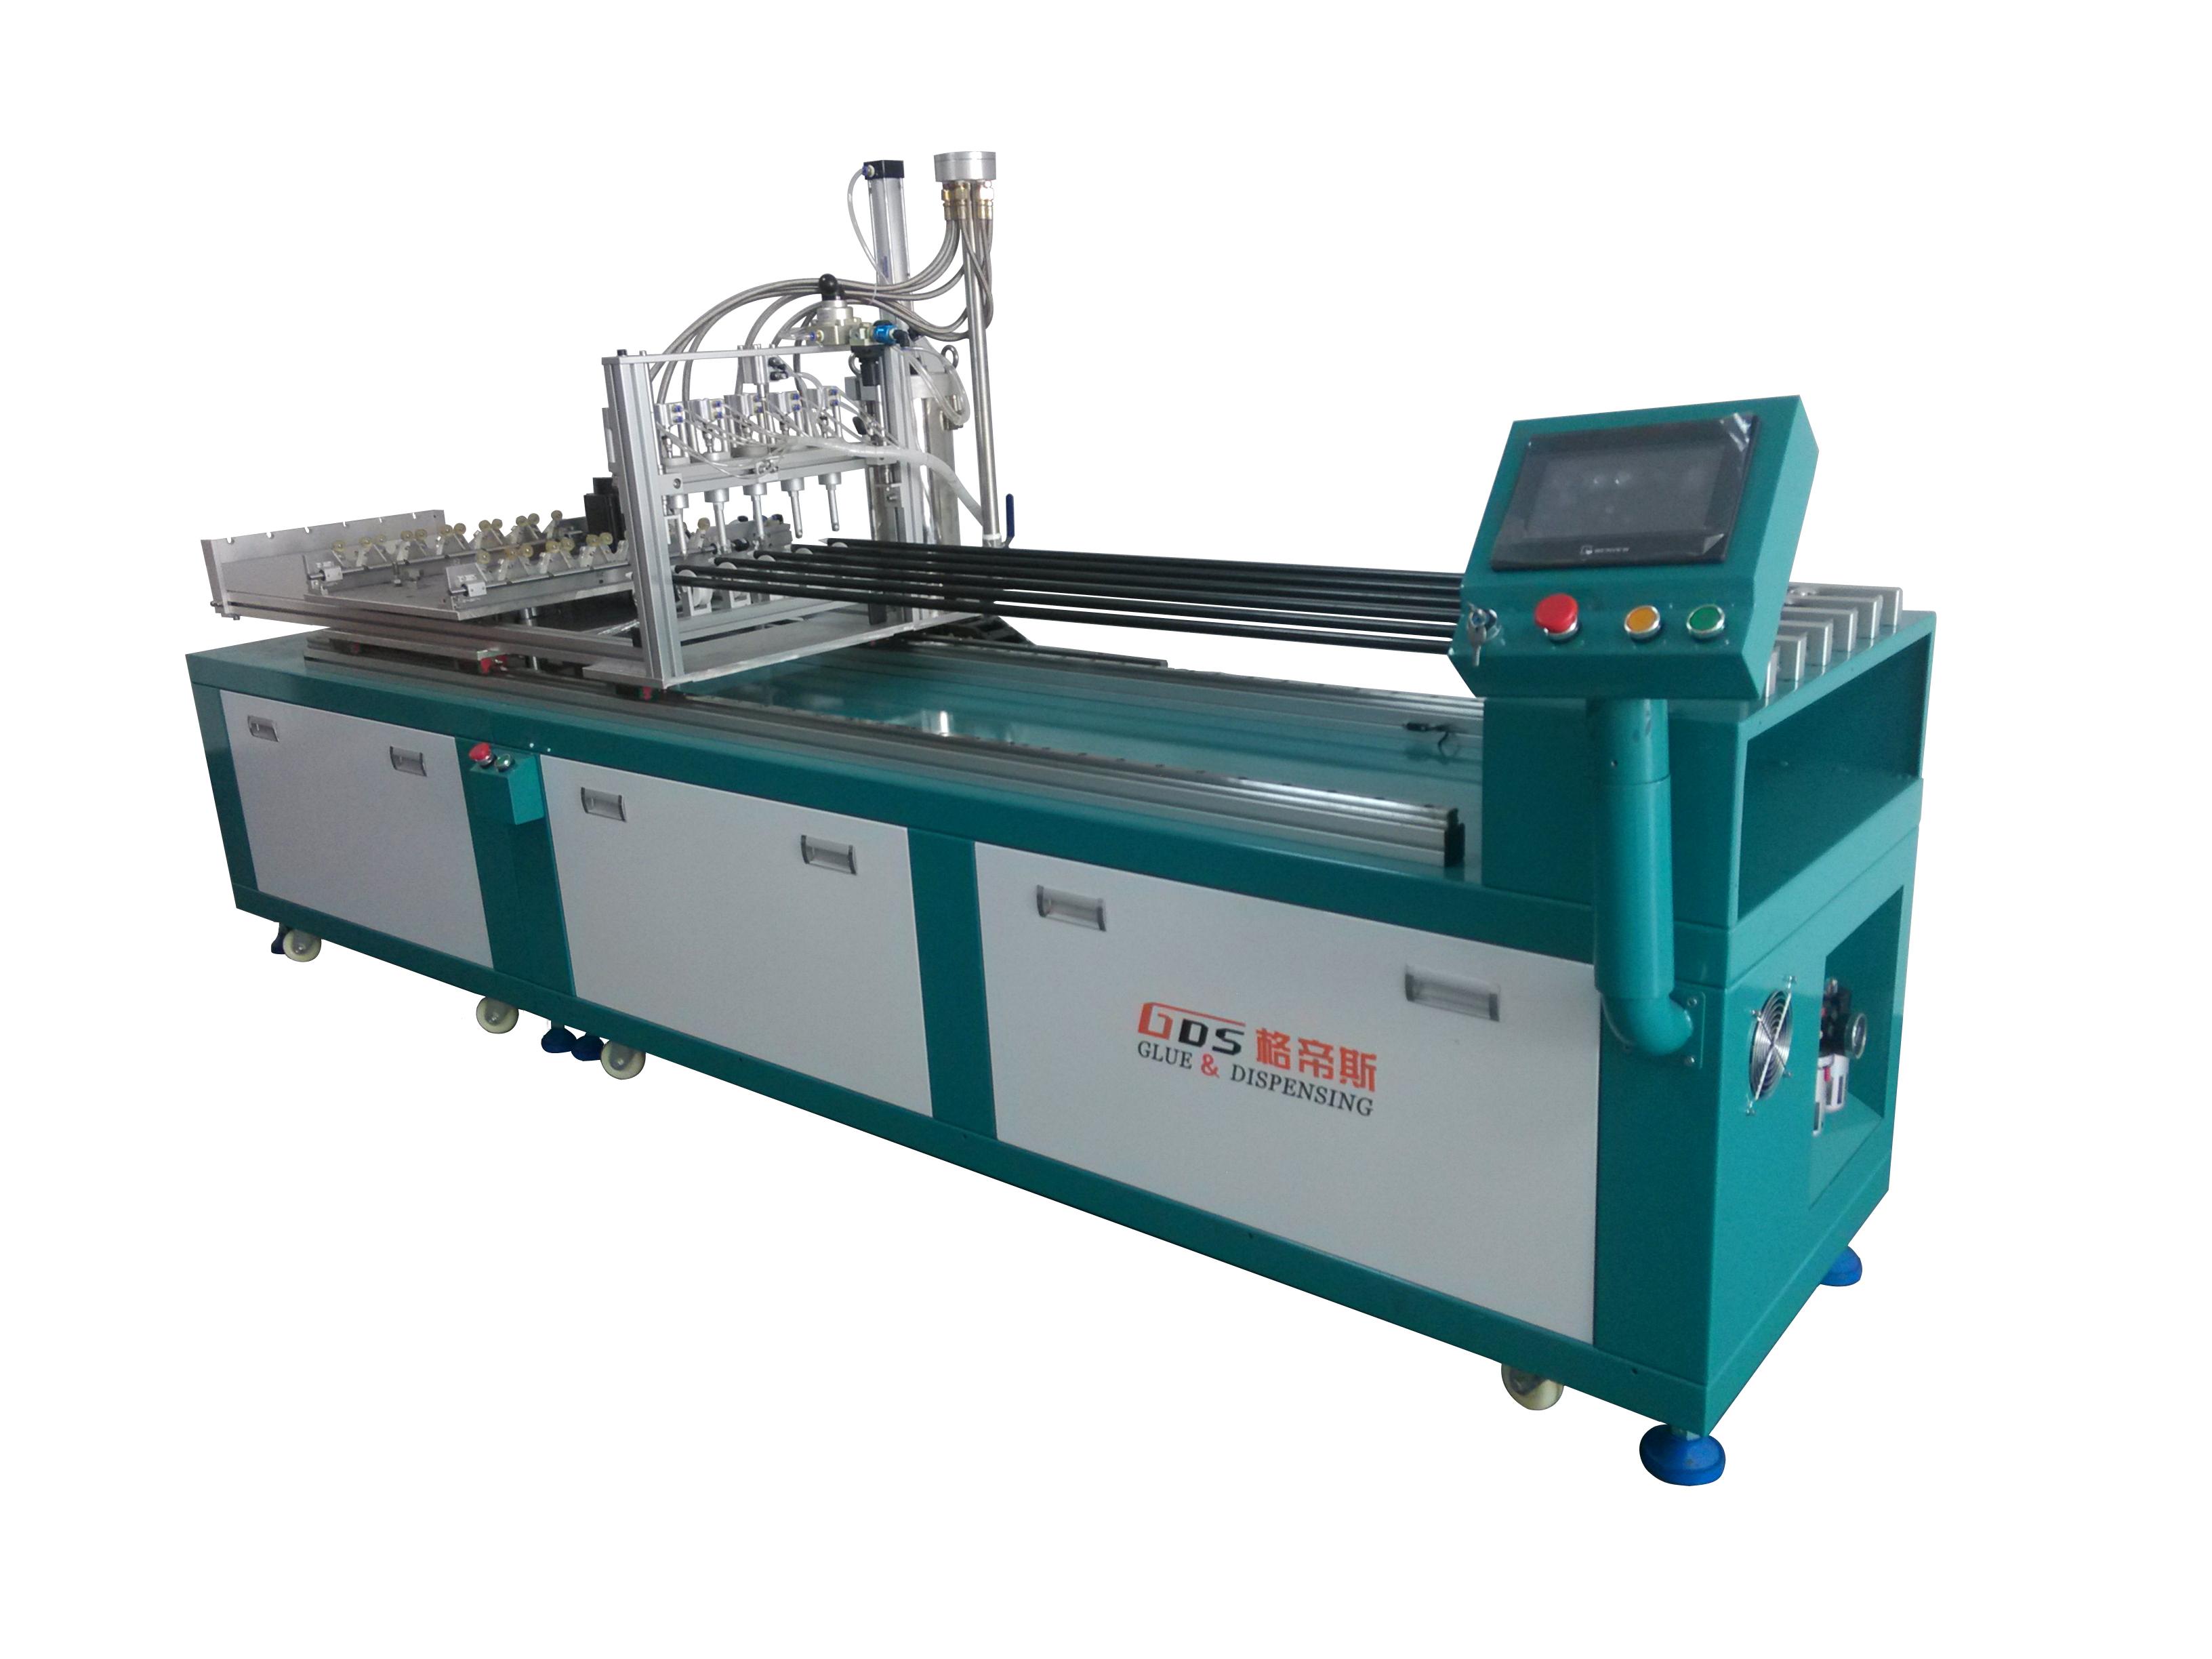 TD-1206 T8/T5 Glass Tube Glue Dispensing Machine